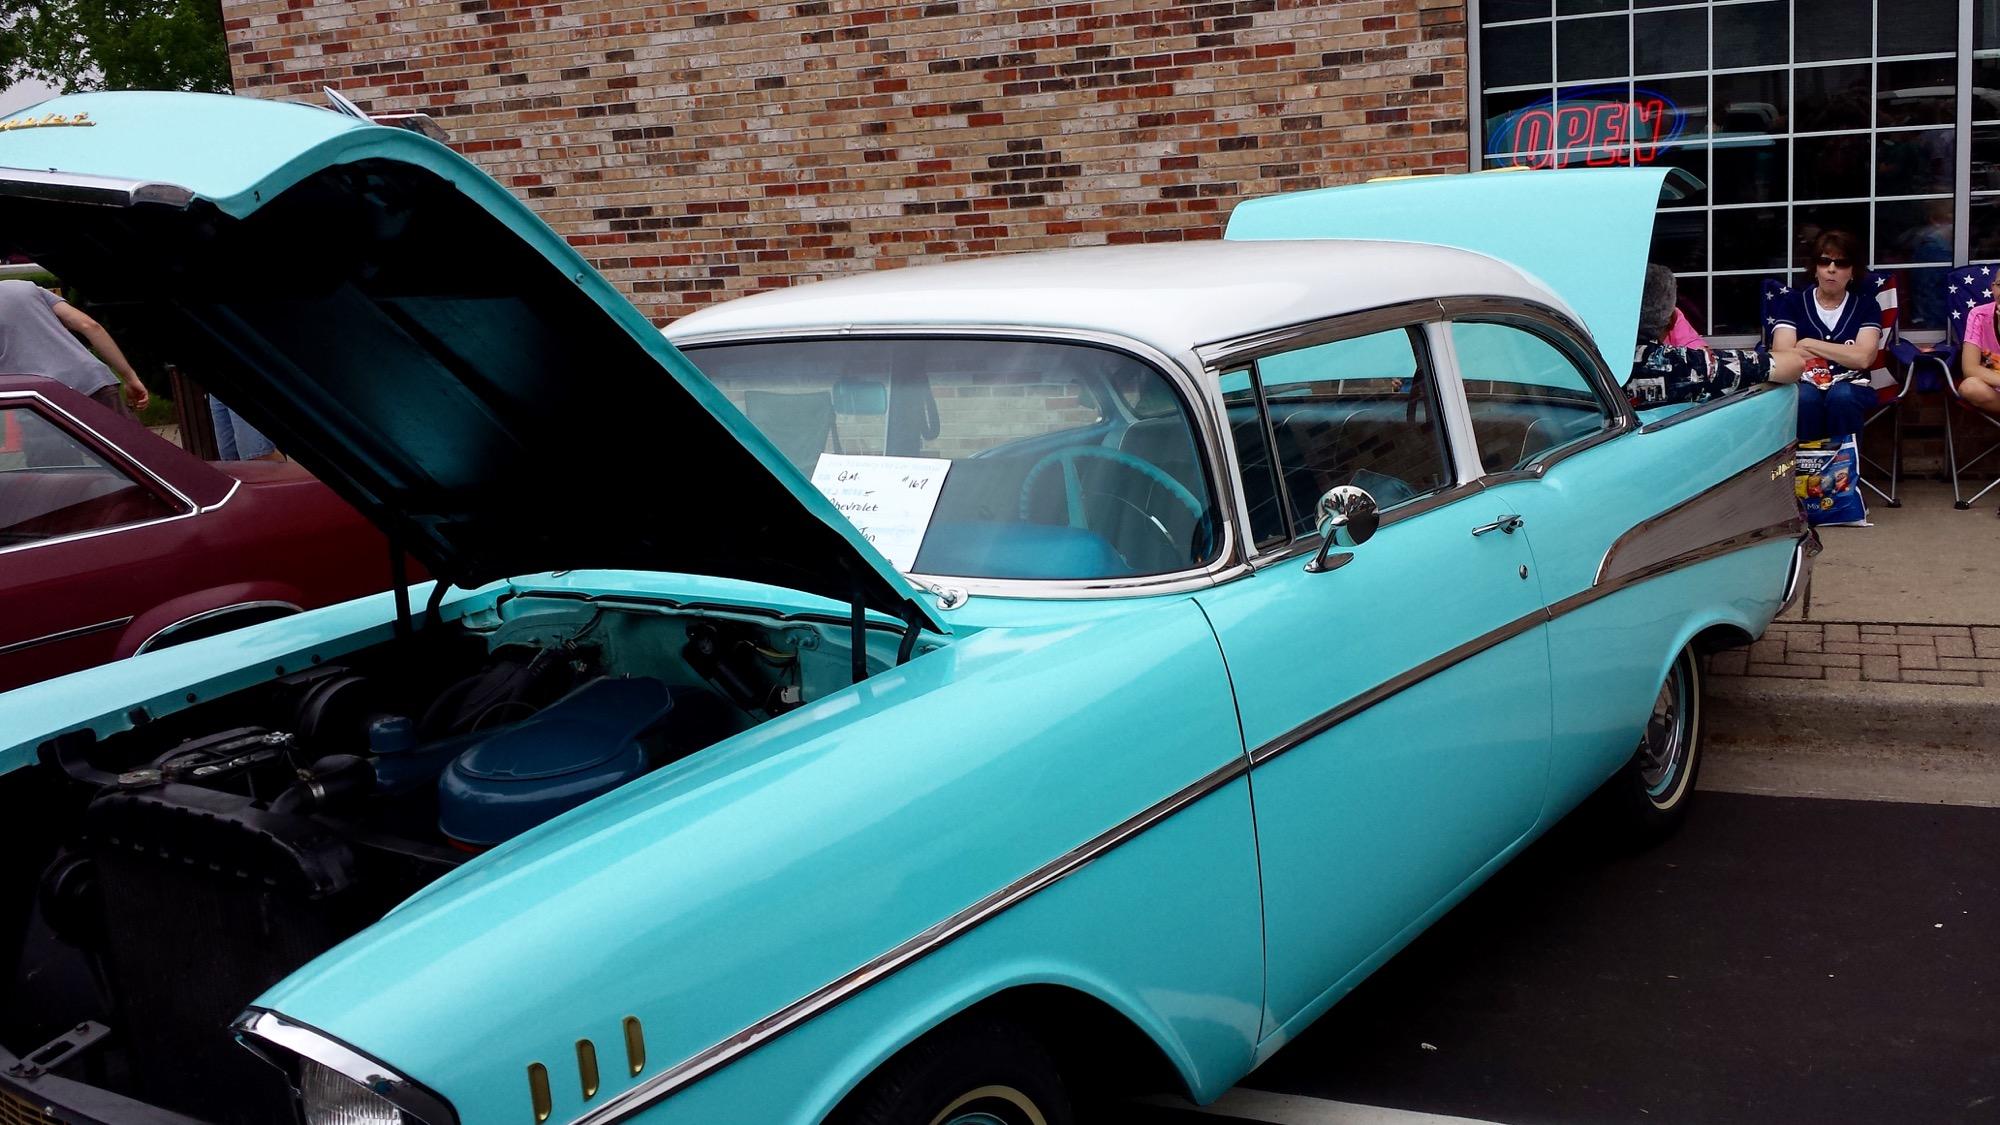 The 35th Annual Vicksburg Michigan Old Car Festival